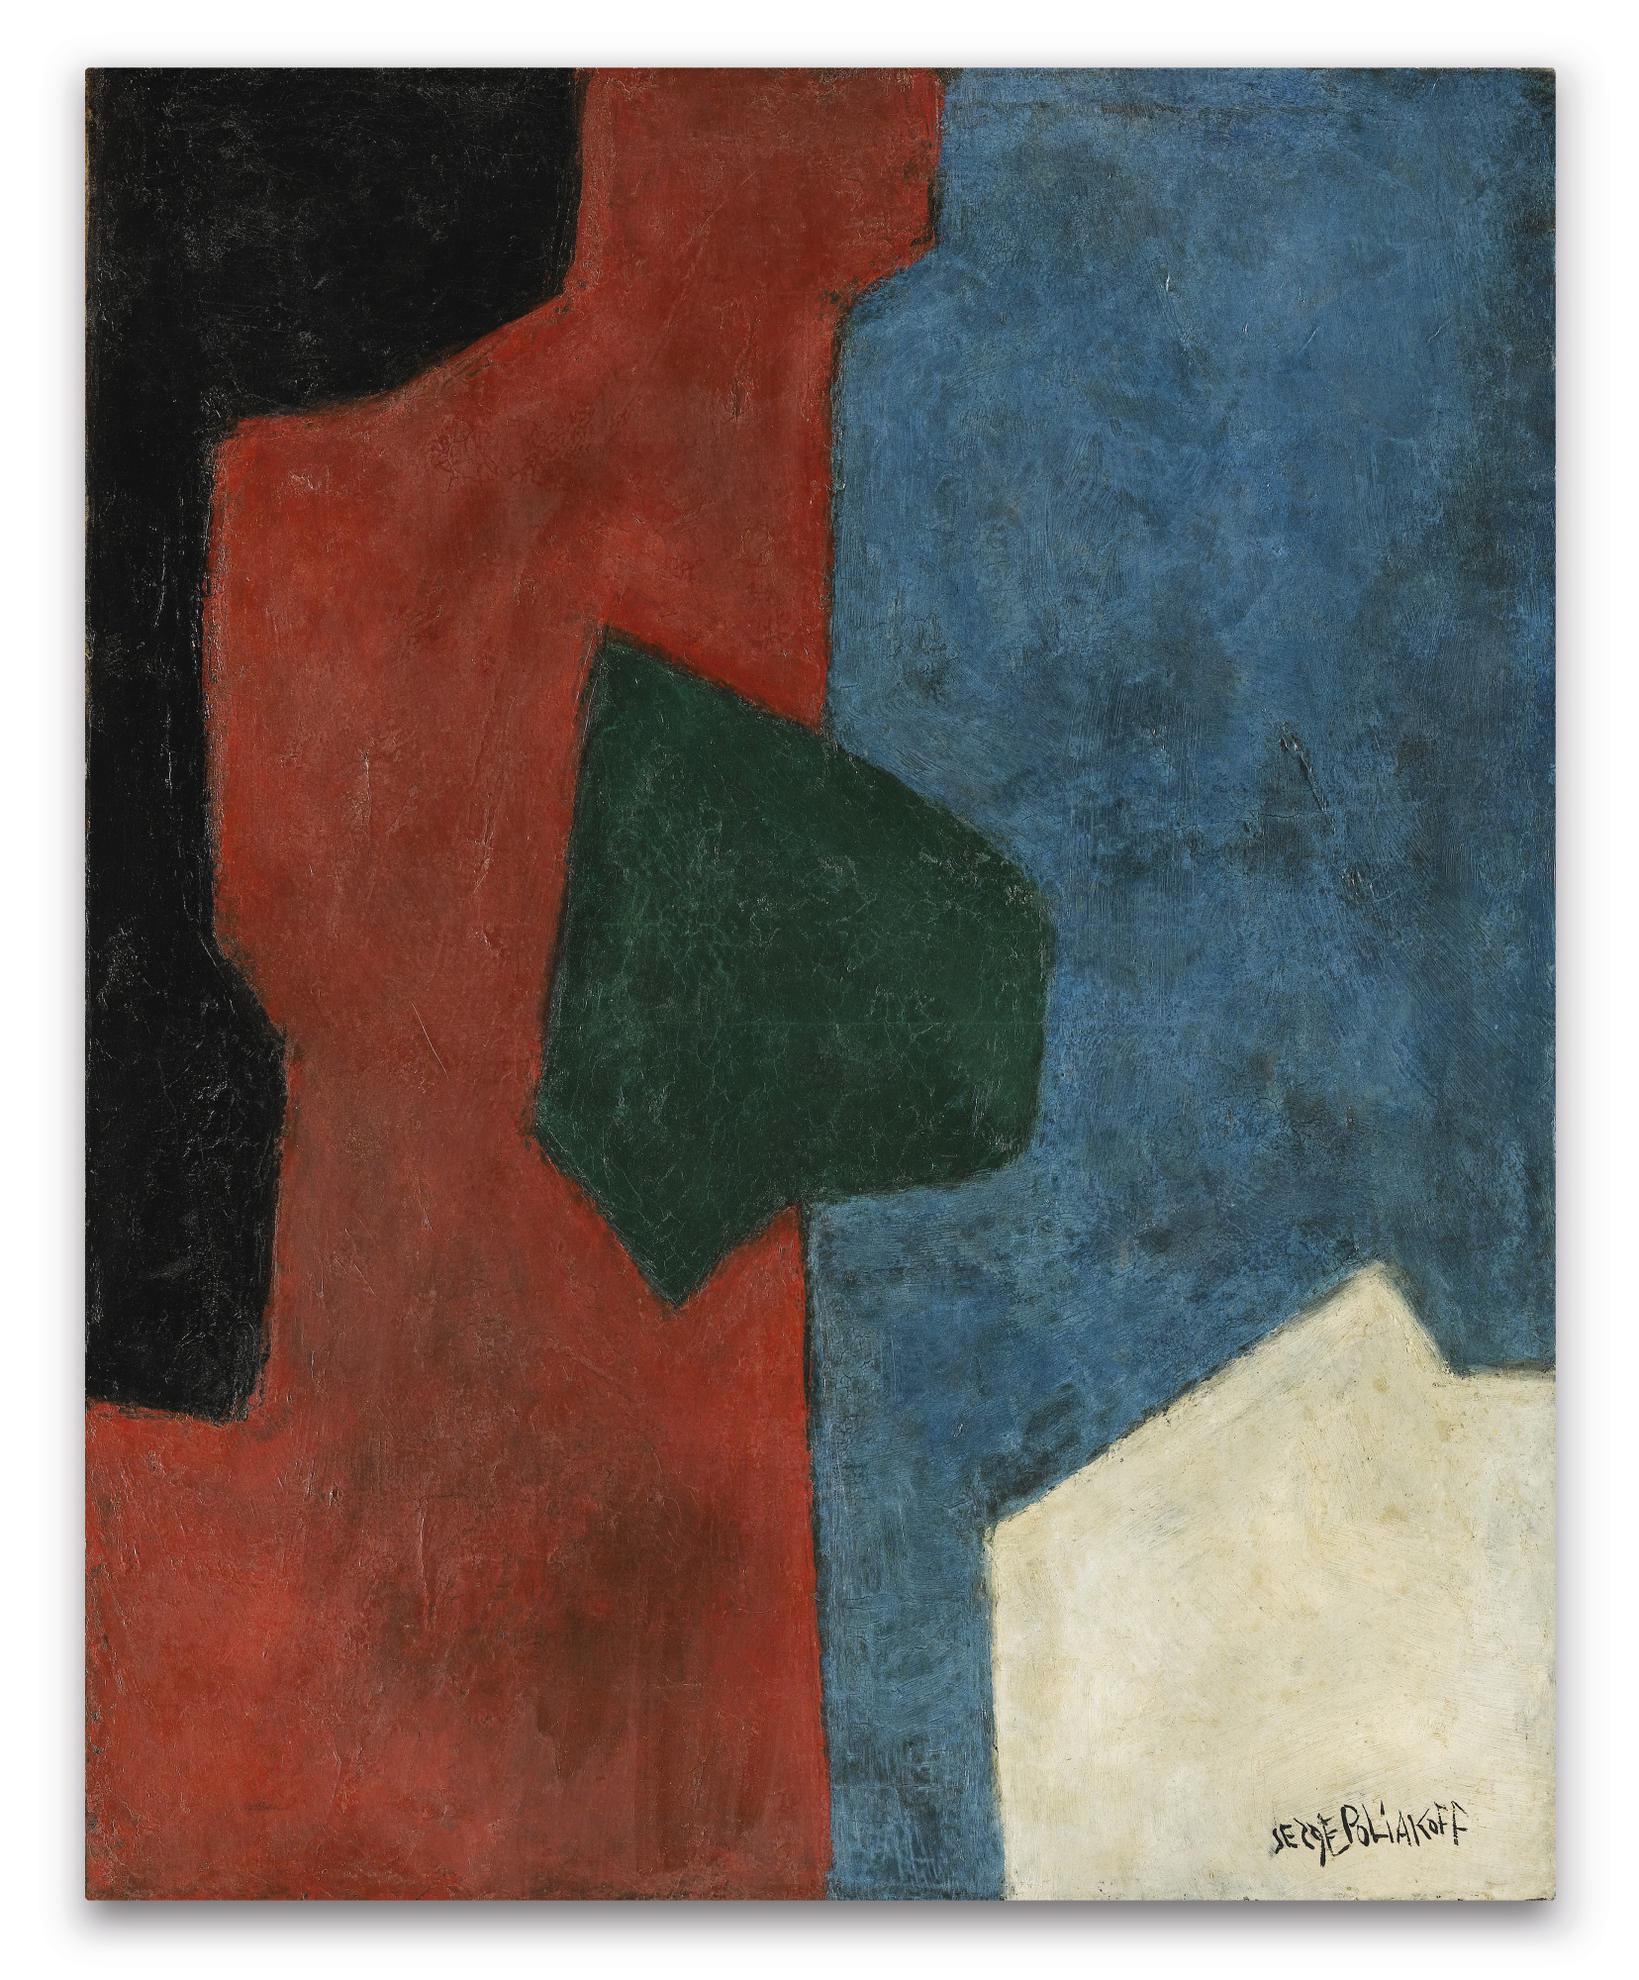 Serge Poliakoff-Composition Abstraite-1961